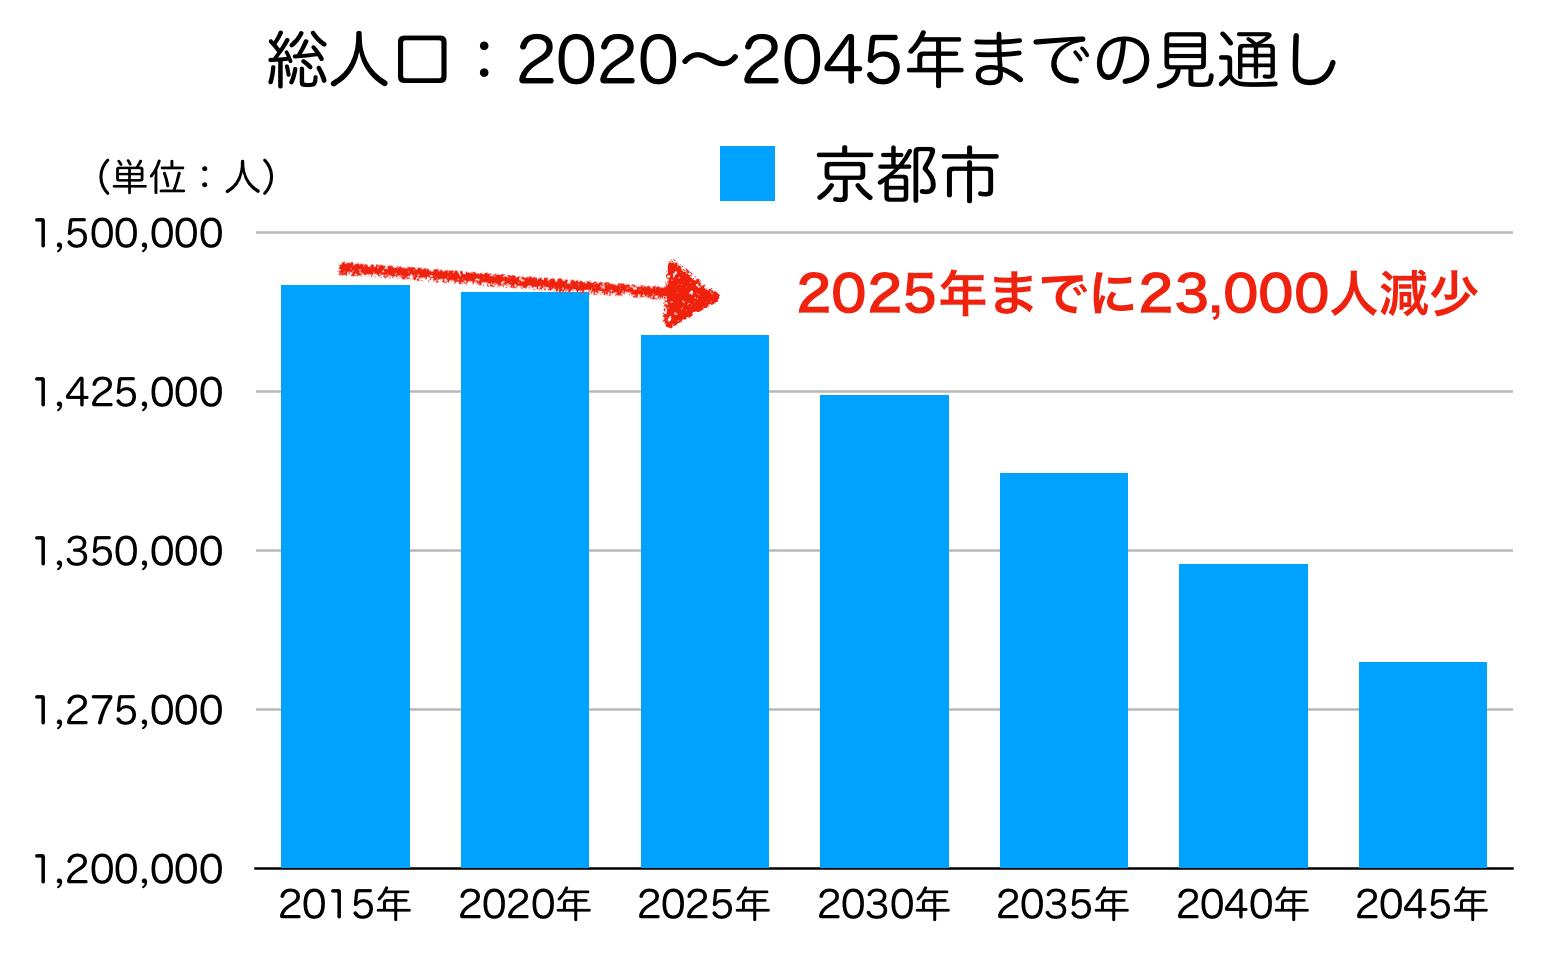 京都市の人口予測